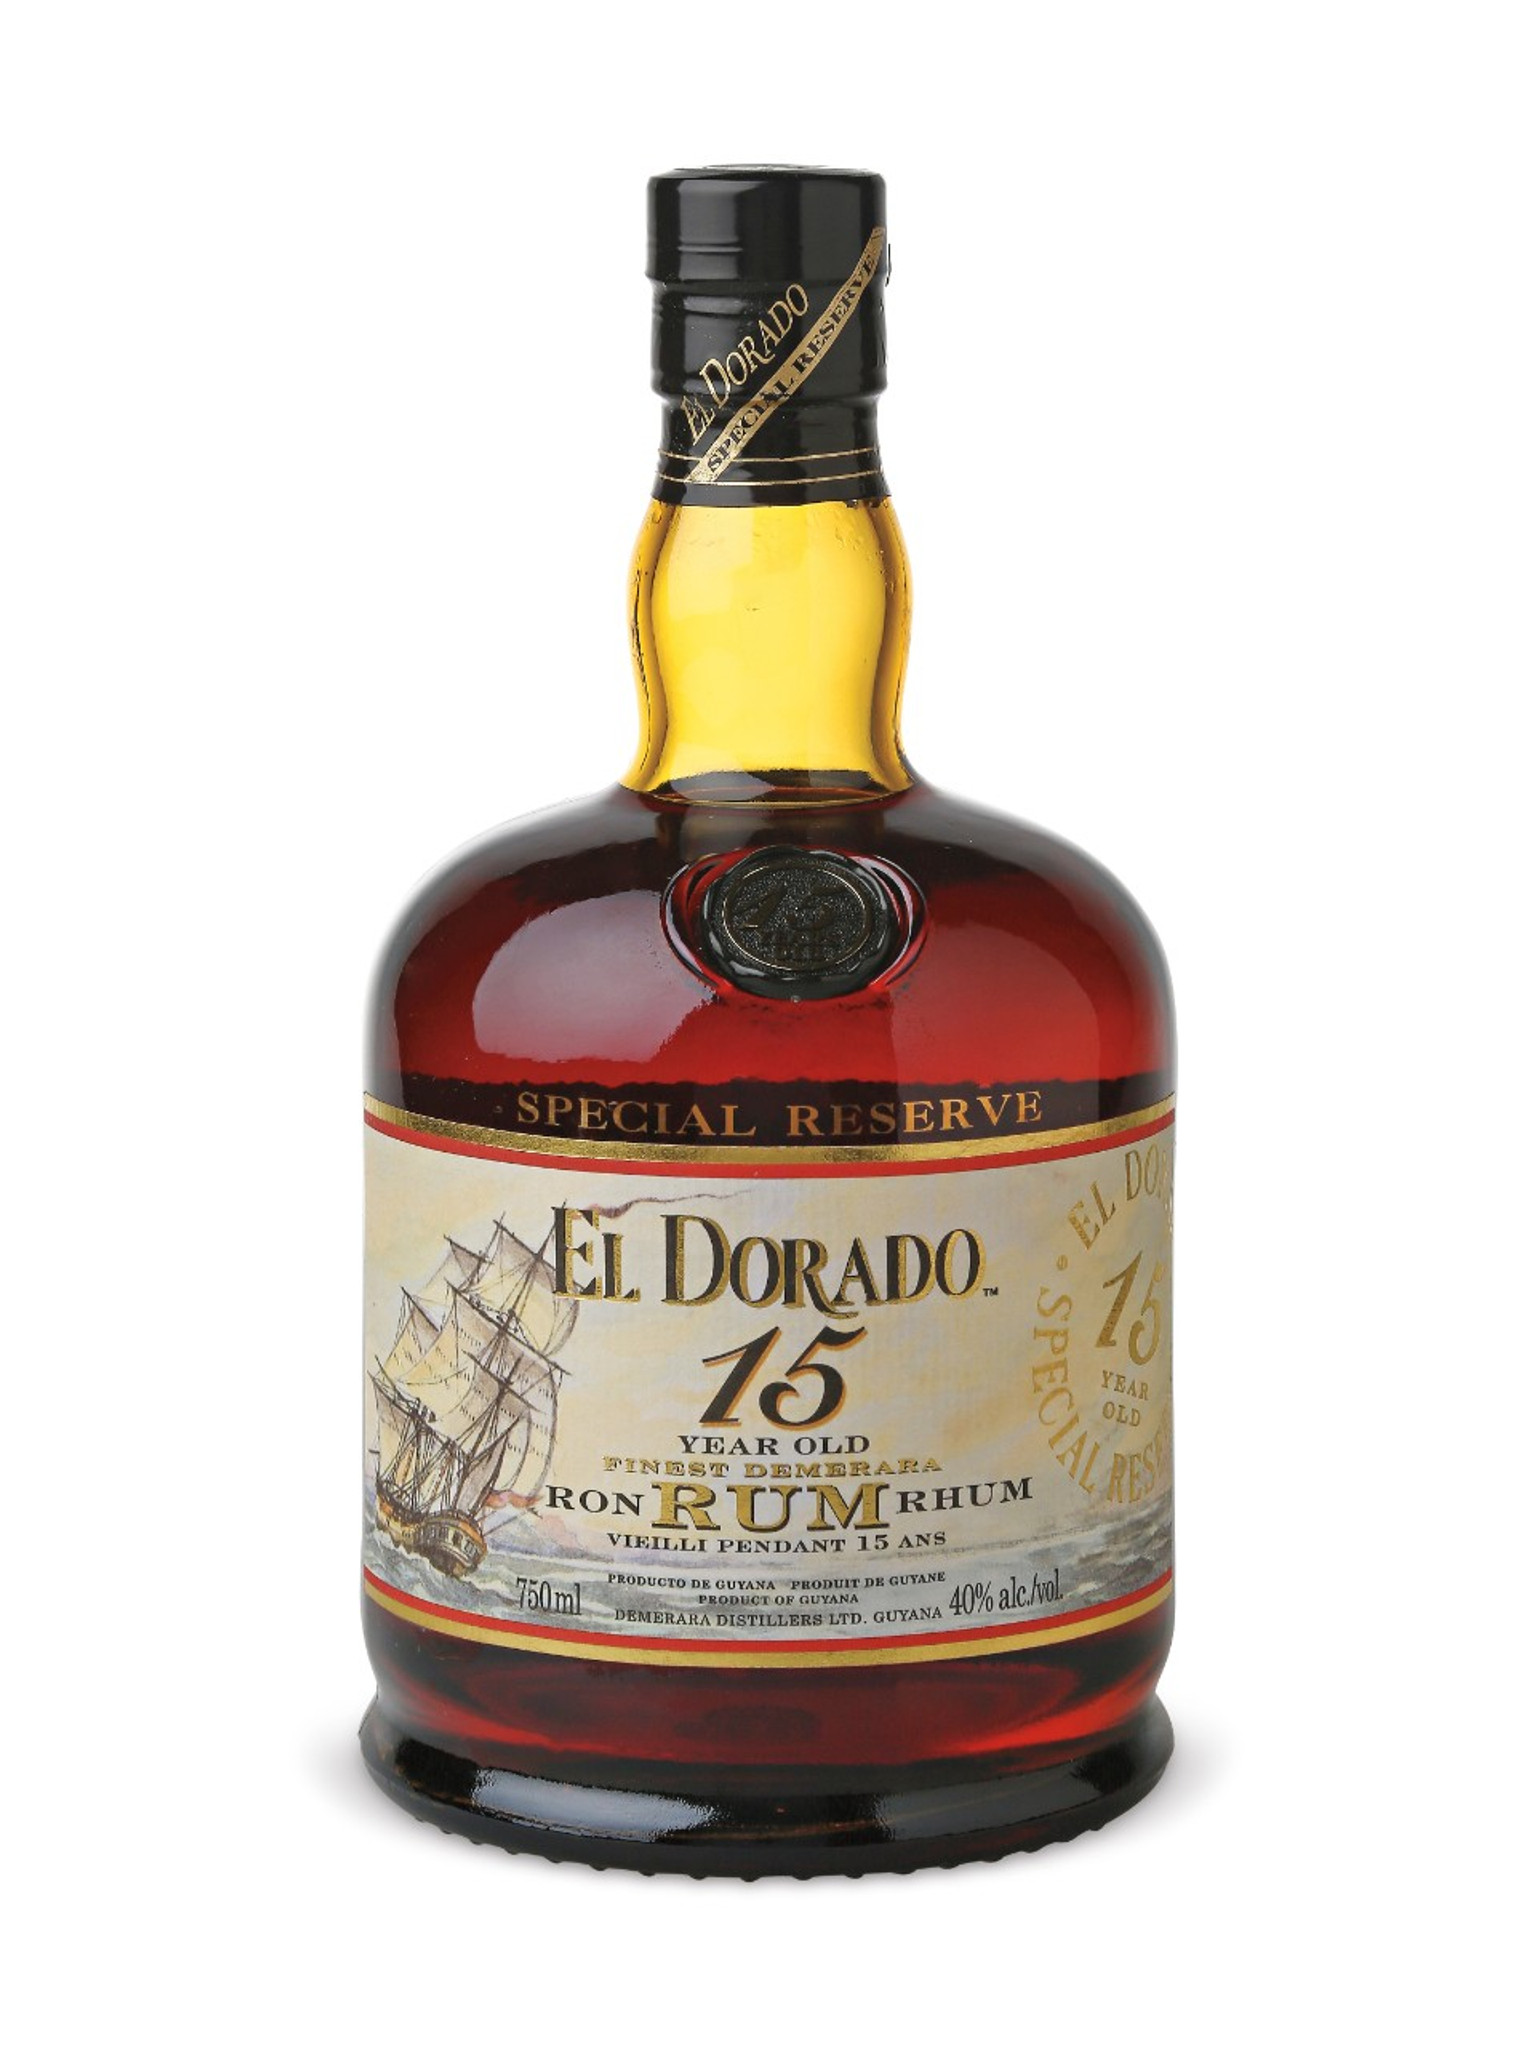 Image result for el dorado special reserve 15